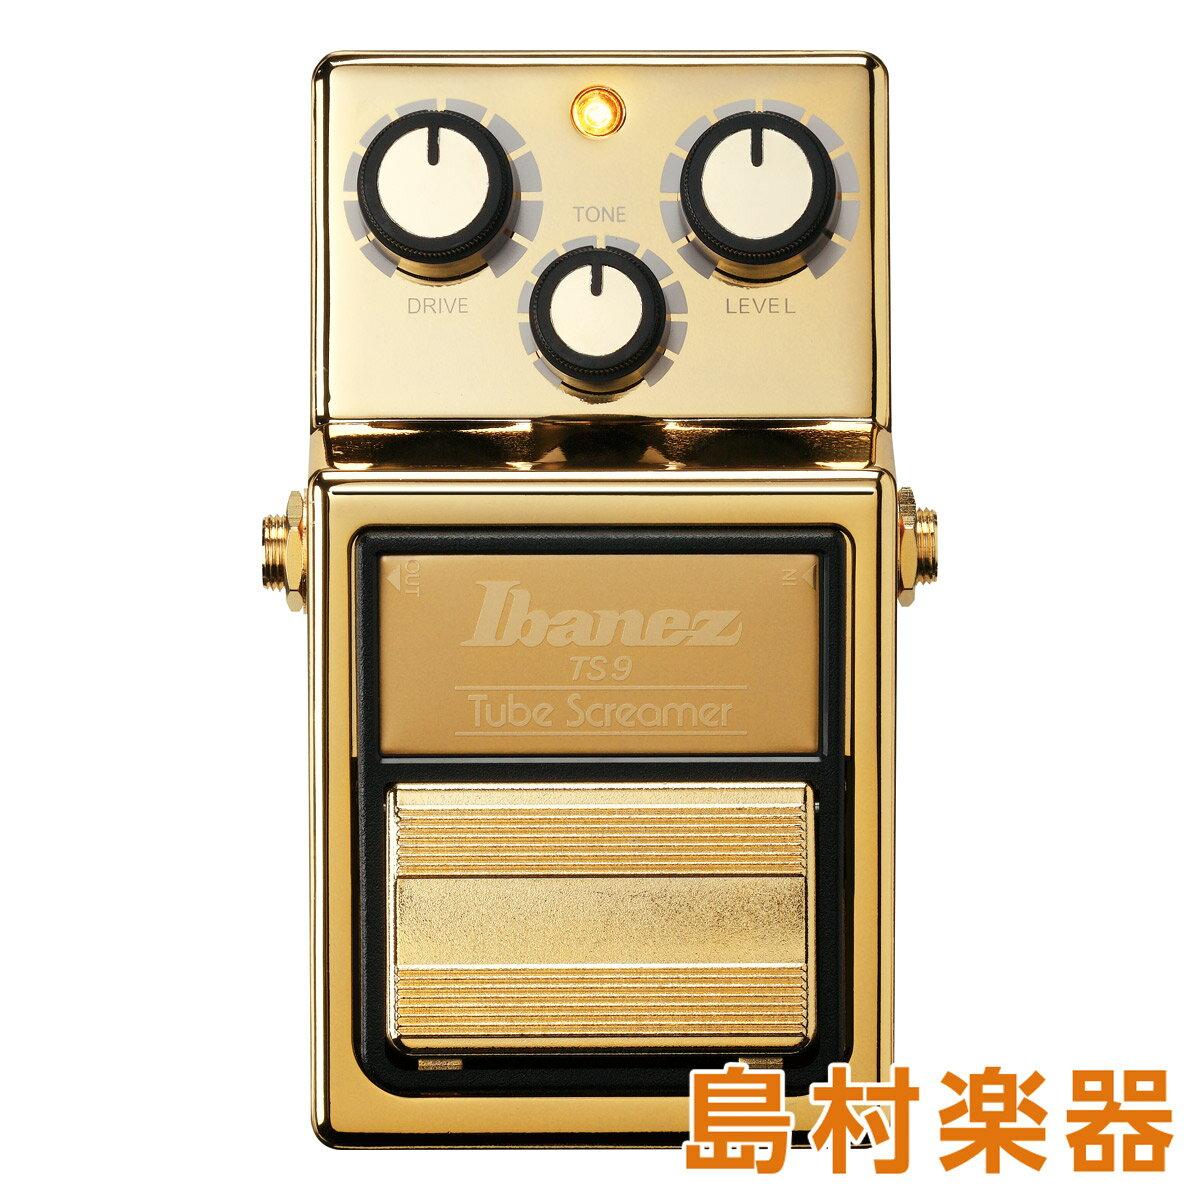 Ibanez TS9 GOLD オーバードライブ 【アイバニーズ Tube Screamer】【数量限定】